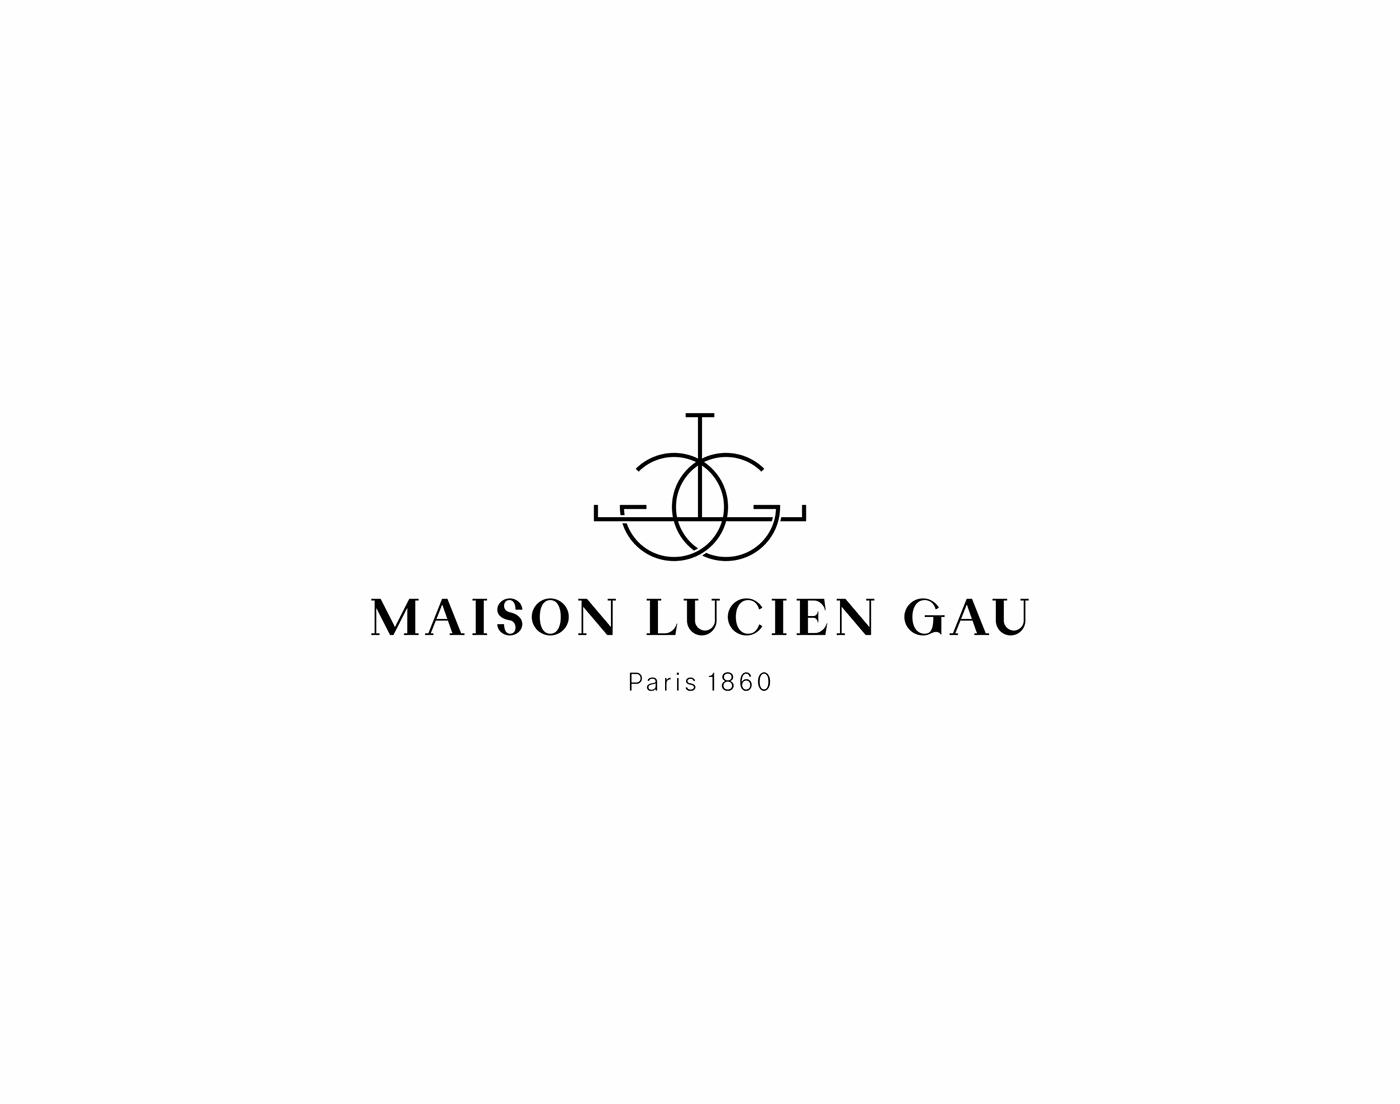 Maison lucien gau brand identity on behance for Maison brand